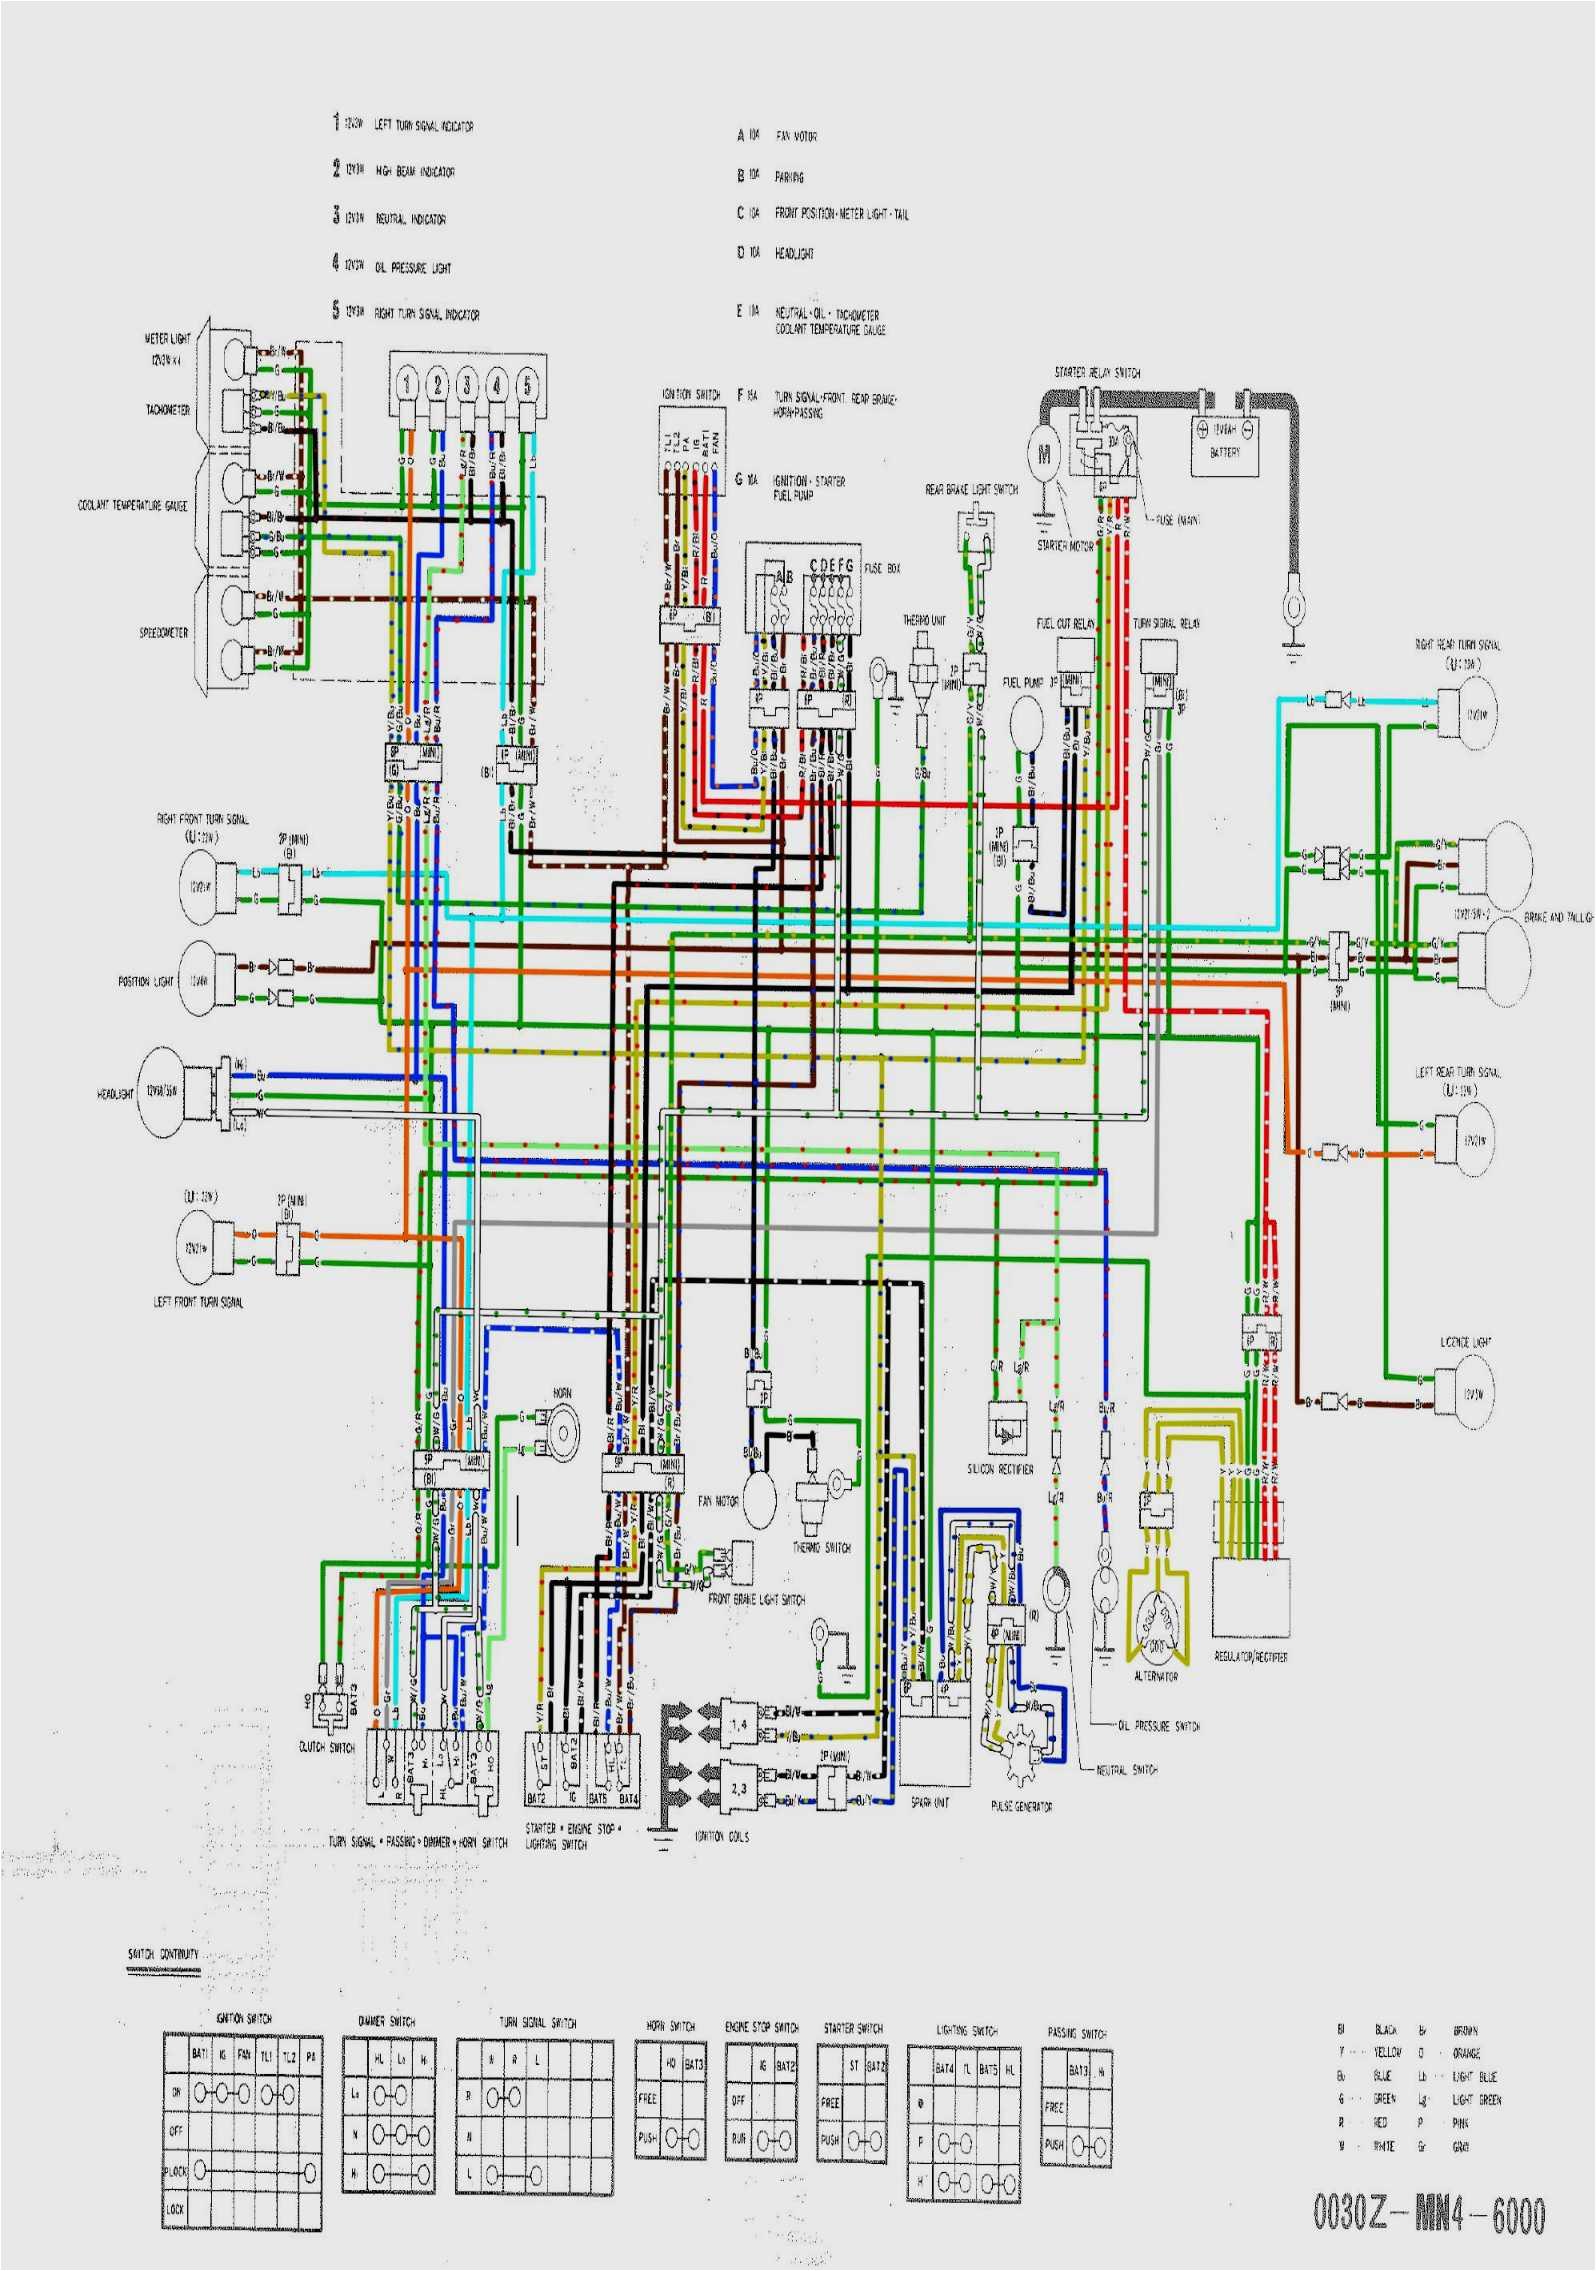 2006 honda odyssey radio wiring diagram 2001 honda cbr 600 f4i wiring diagram various information and